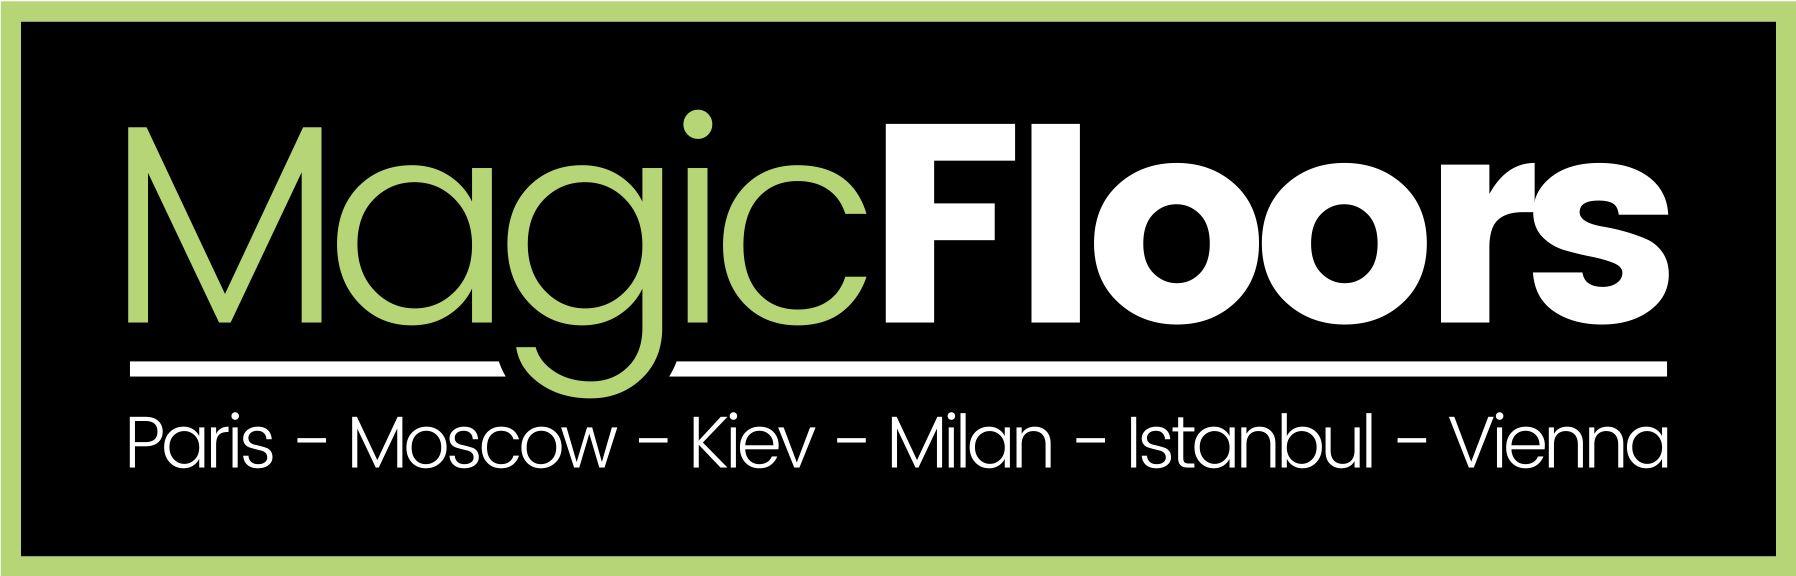 Magic Floors Logo